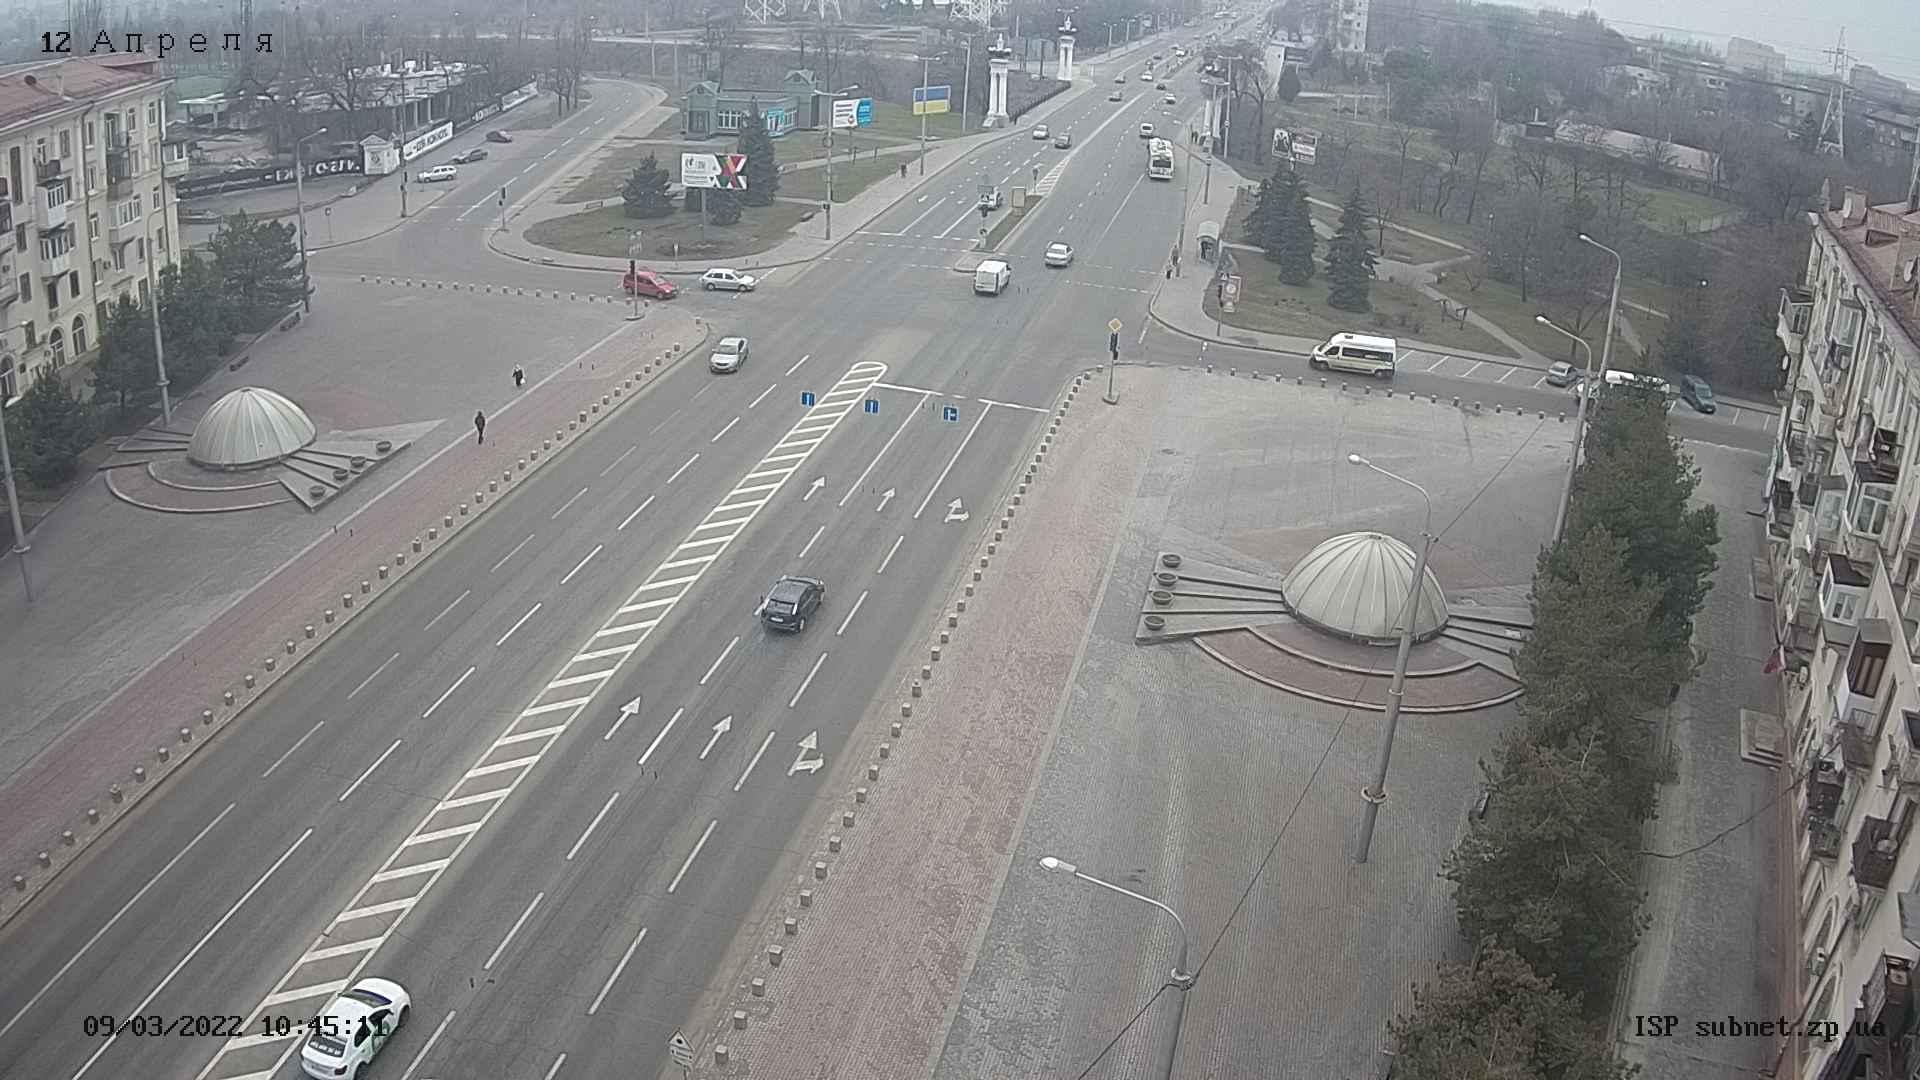 Webcam Voznesenka: Площадь Поляка, проспект Ленина